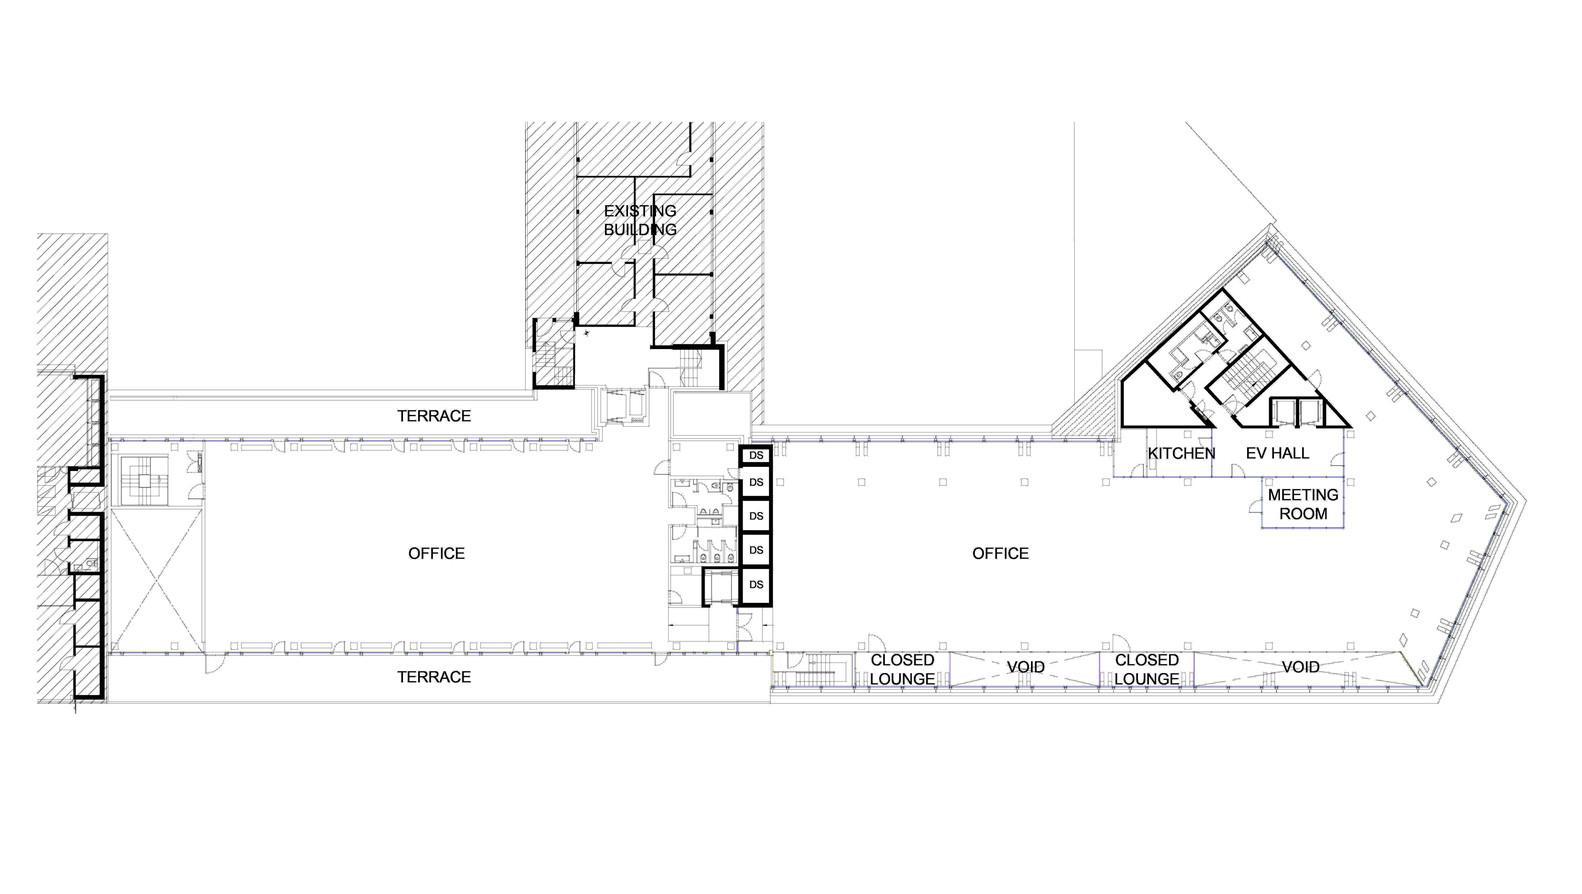 Office Building Floor Plans: Gallery Of Tamedia Office Building / Shigeru Ban